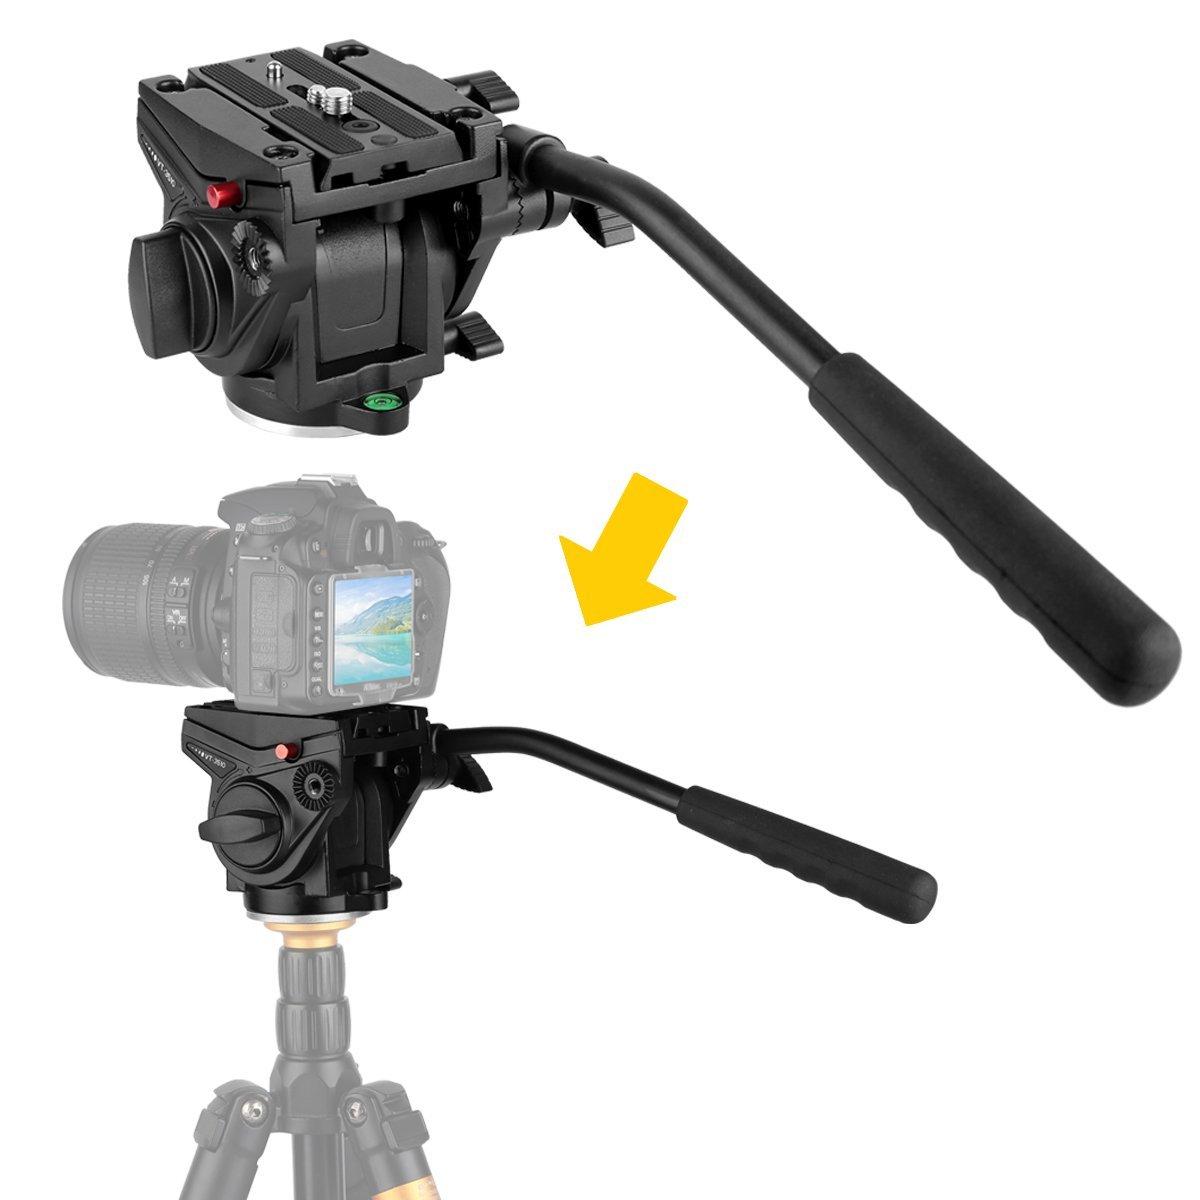 Kamisafe VT-3510 Heavy Duty Video Camera Tripod Action Fl...